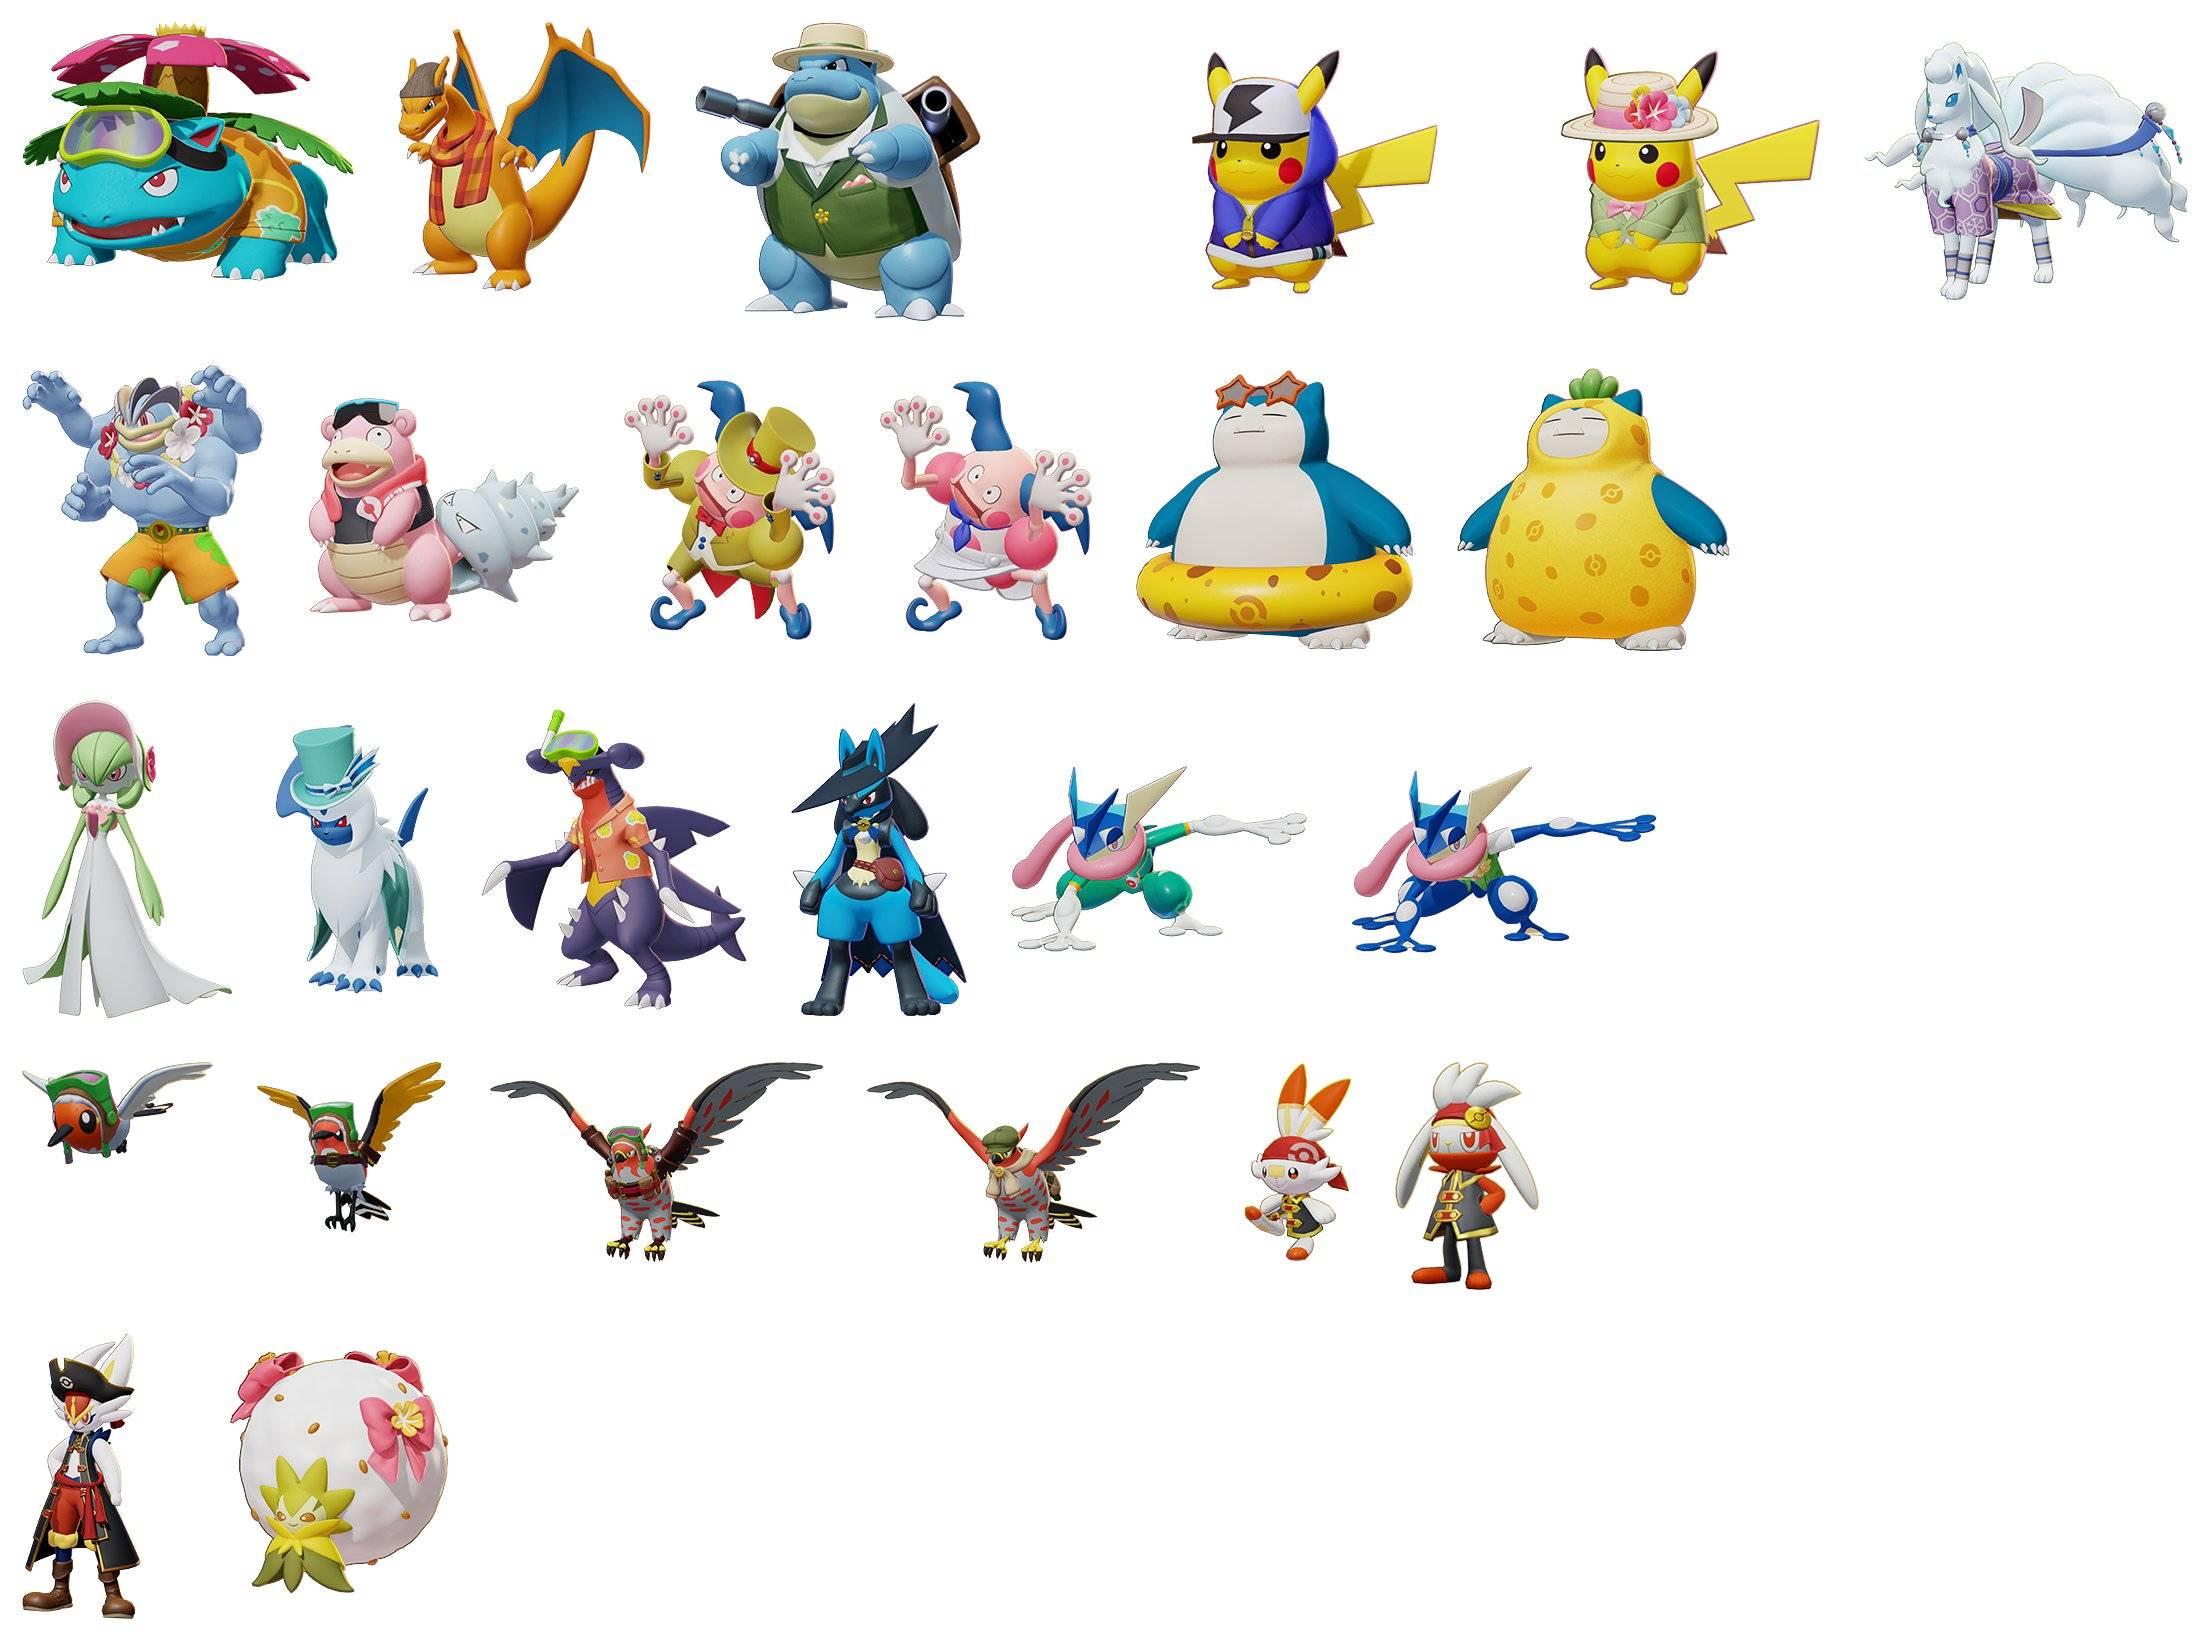 skins-pokémon-unite